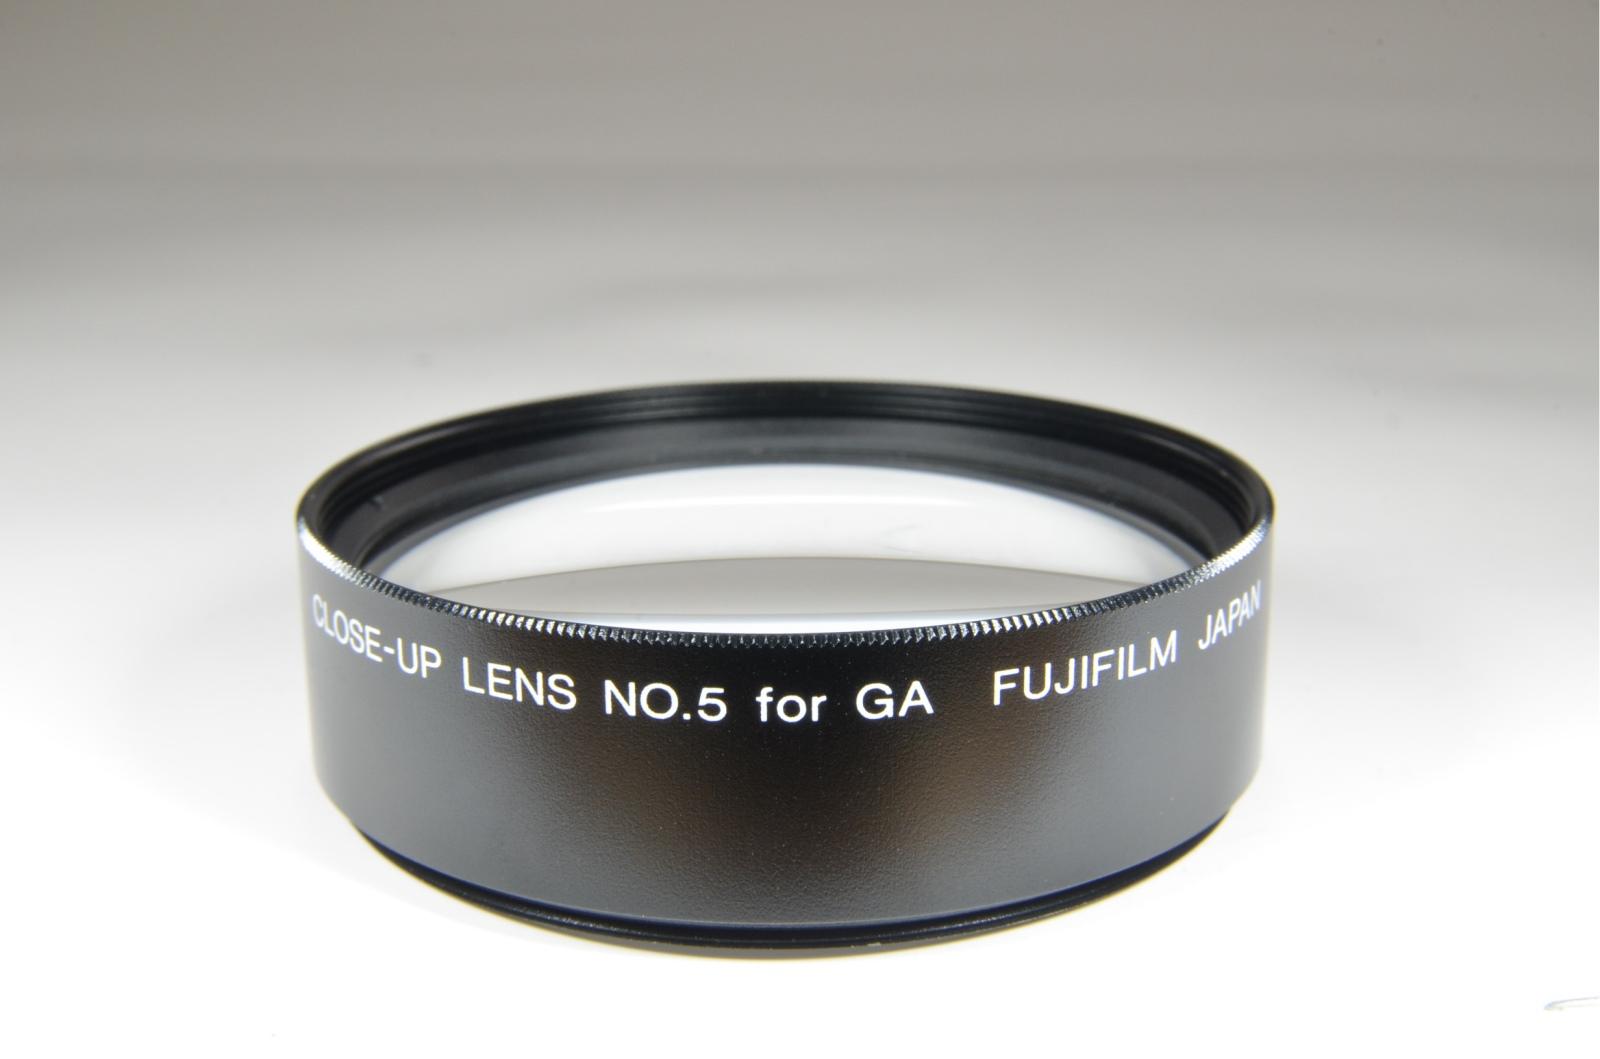 fuji fujifilm ga close-up lens kit no.5 for ga645 medium format camera